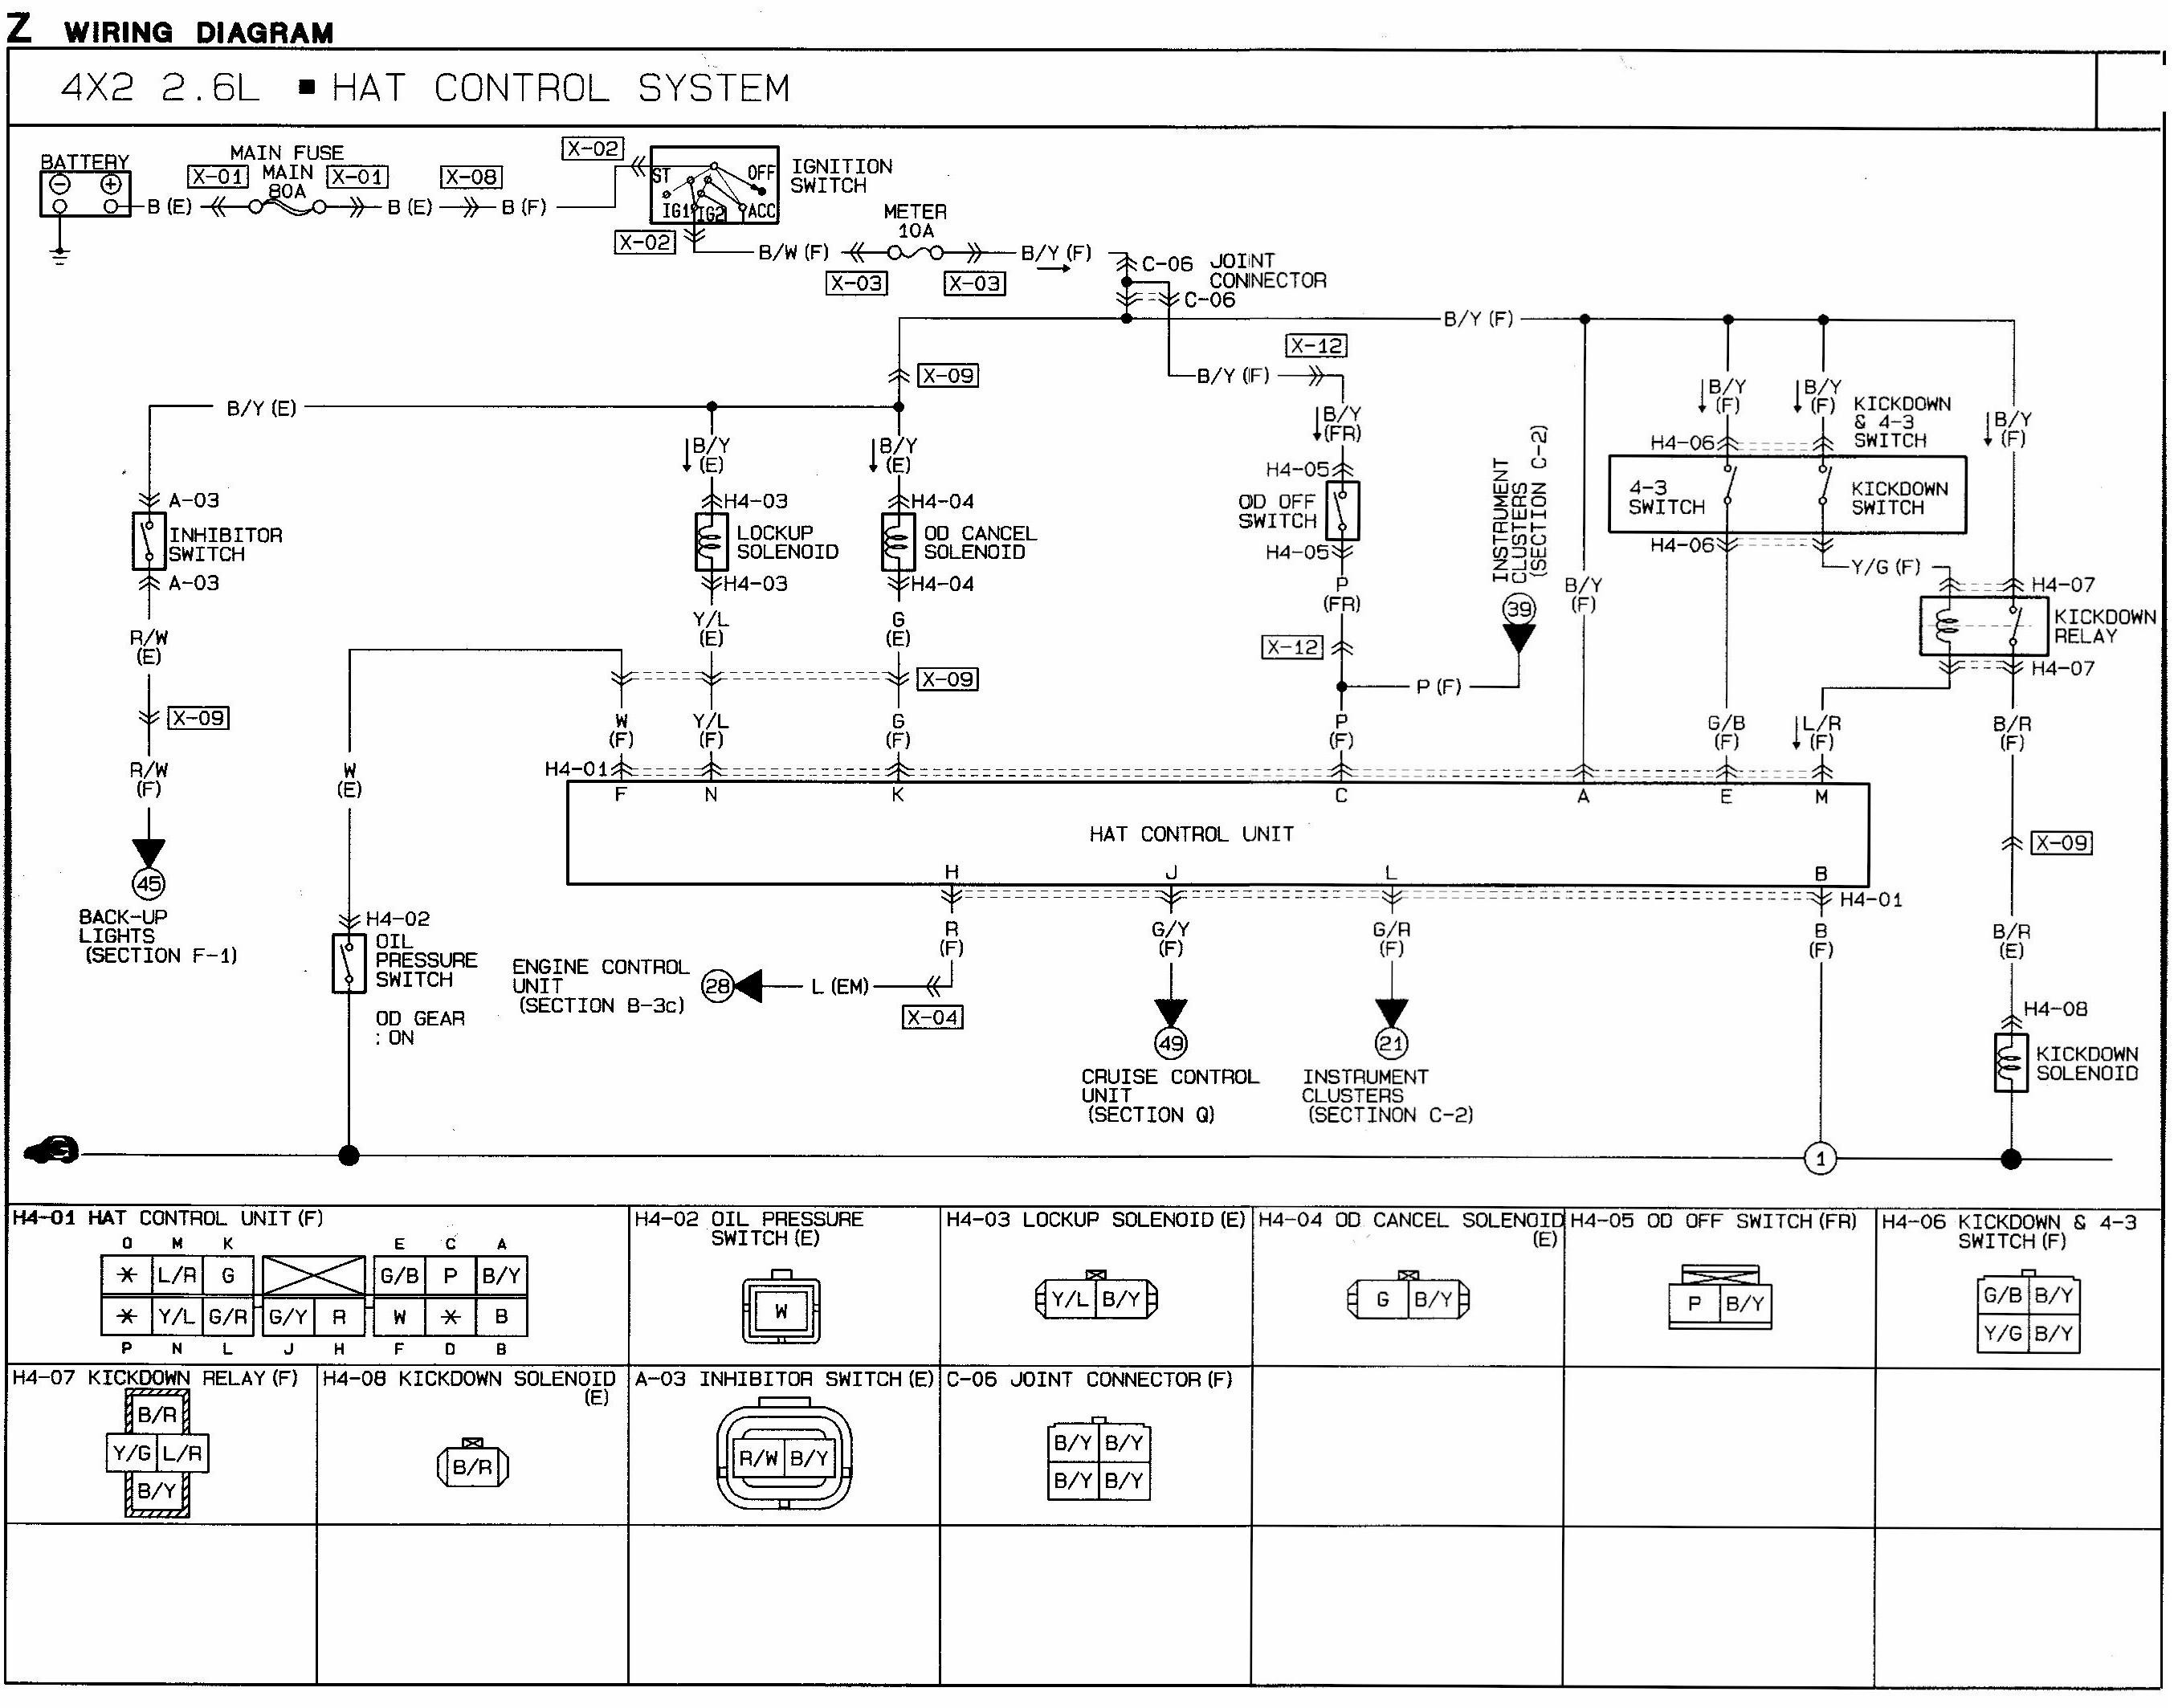 1993 Mazda B2600i Wiring Diagram G1888 Ez Go Wiring Diagram Bege Wiring Diagram